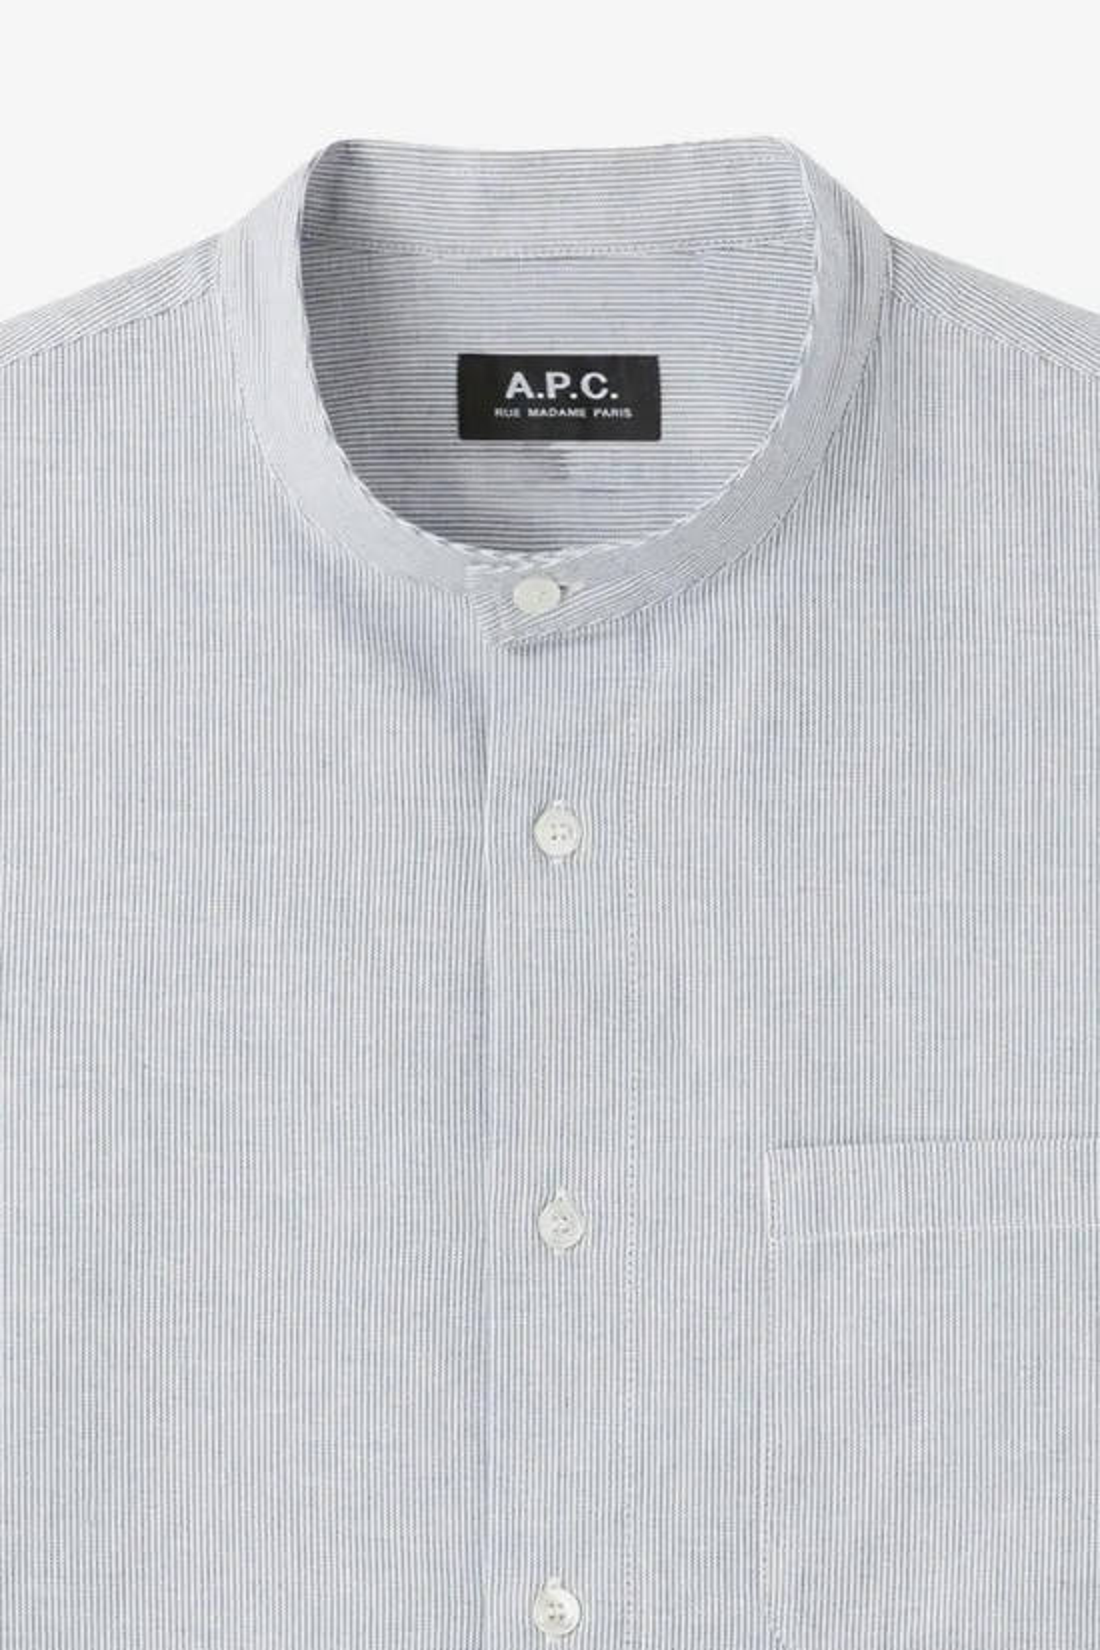 A.P.C. / Chemise mark Bleu fonce